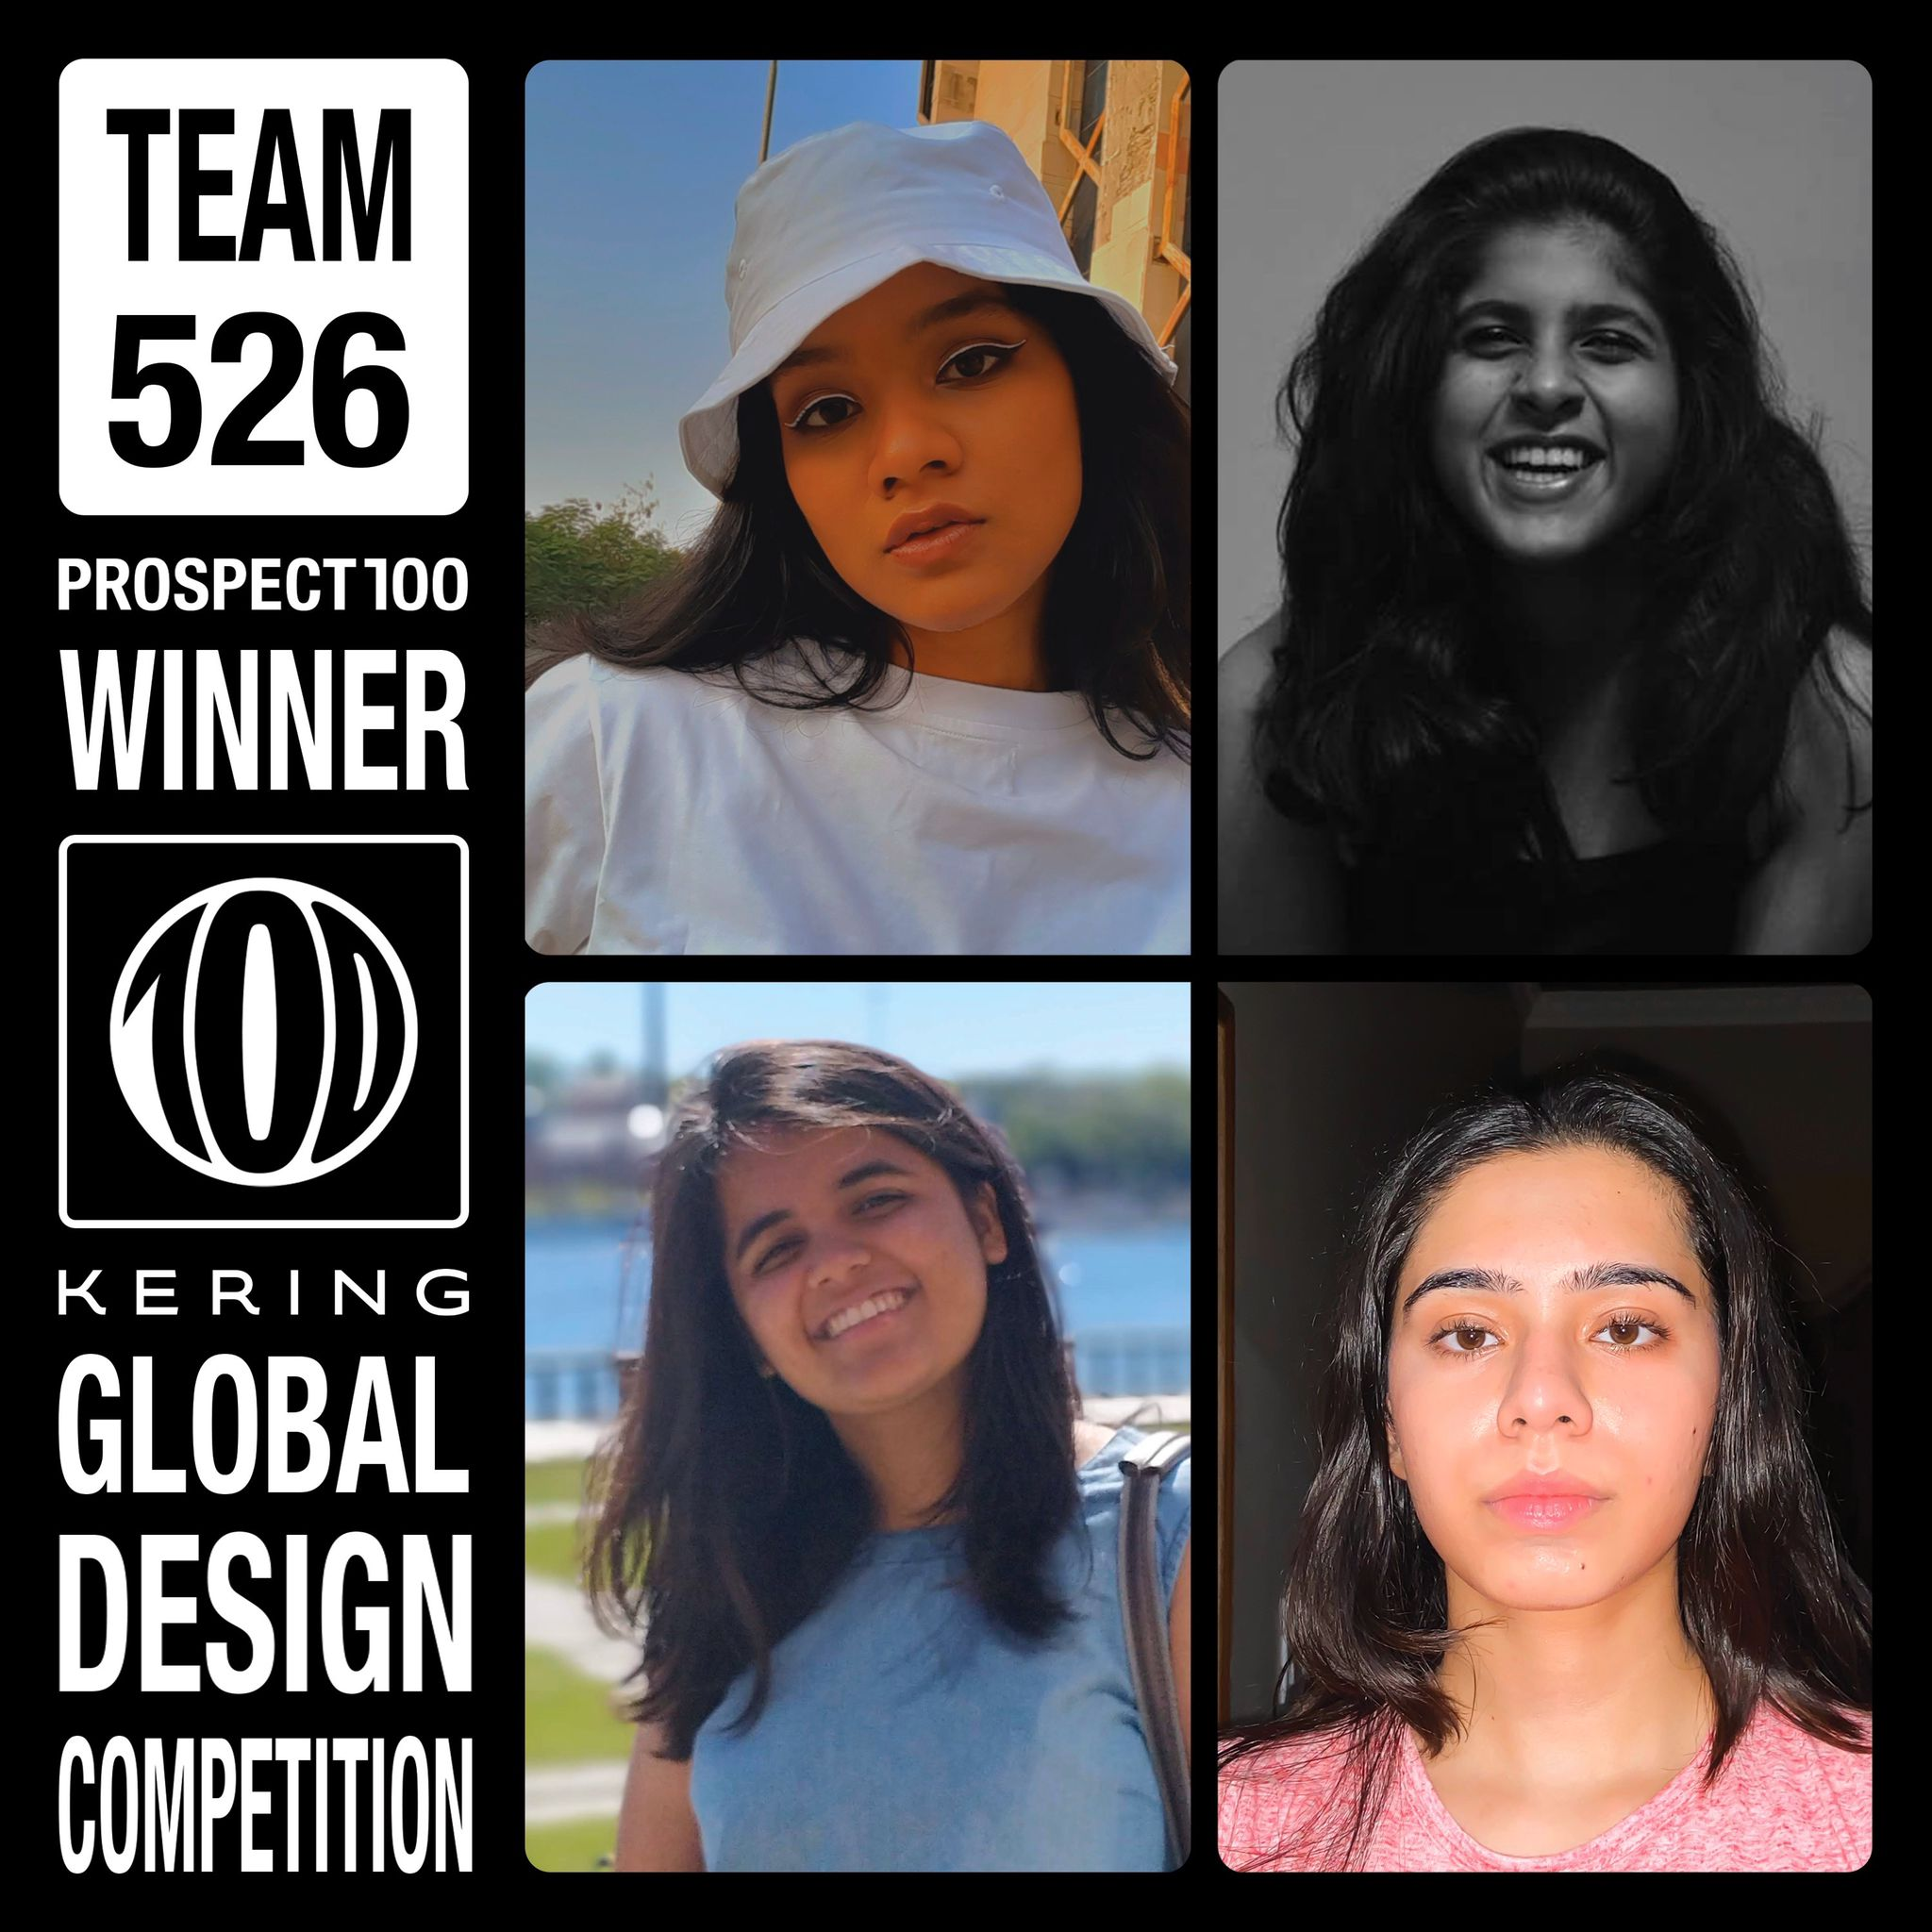 Naazneen Sandhu, Sameeksha Ambolikar, Aadya Chachra, and Samruddhi Mane - THE WINNERS